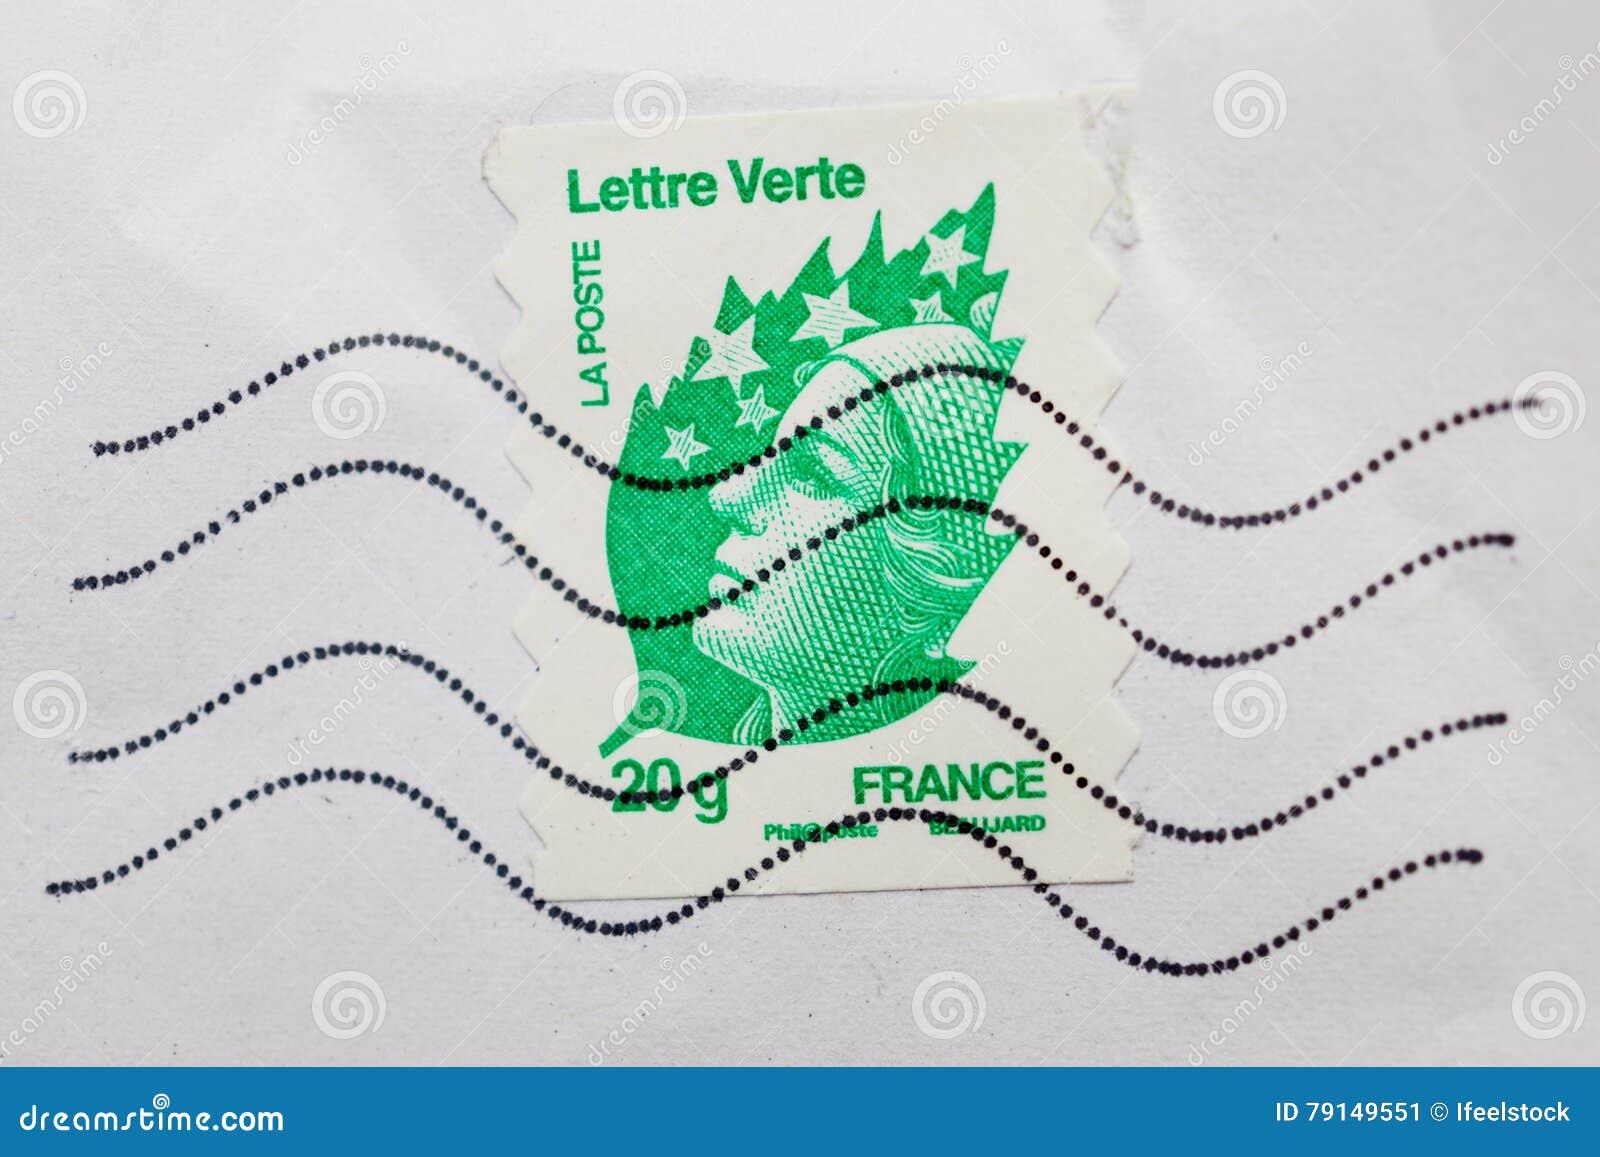 Marianne National Symbol Of France On Lettre Verte From La Post